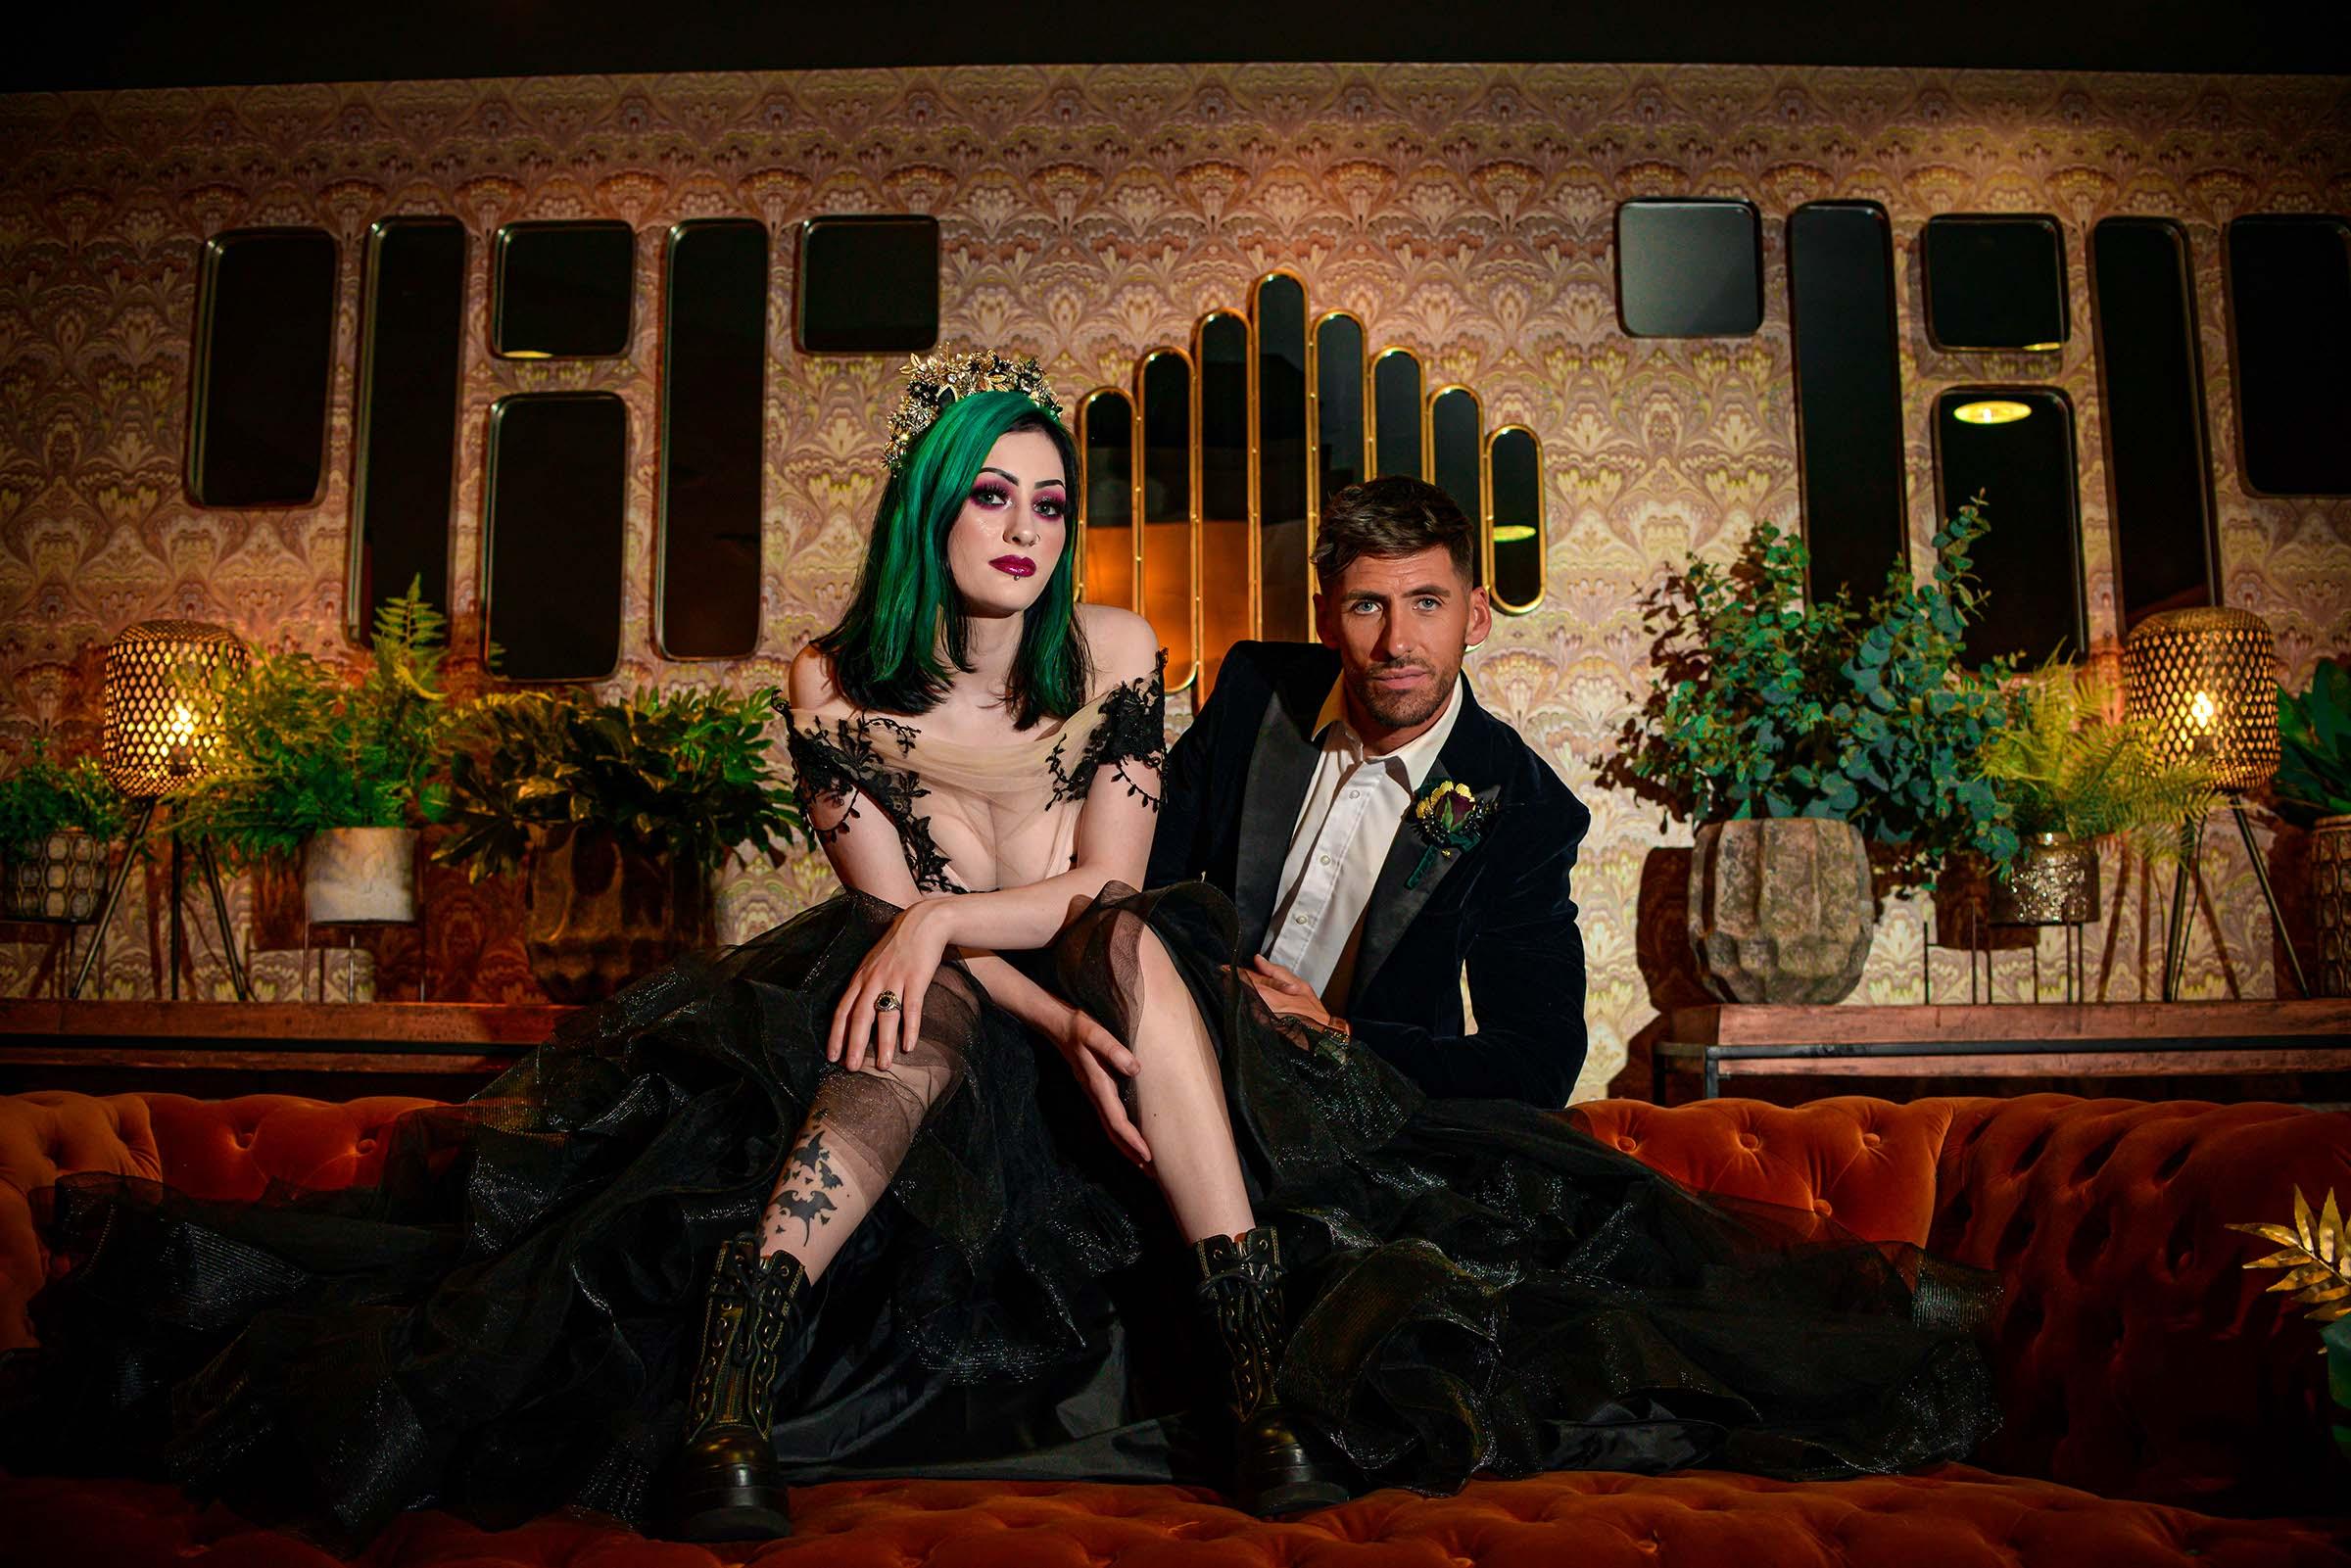 alternative luxe wedding - slytherin wedding - gothic wedding - alternative wedding - alternative wedding venue - edgy wedding styling